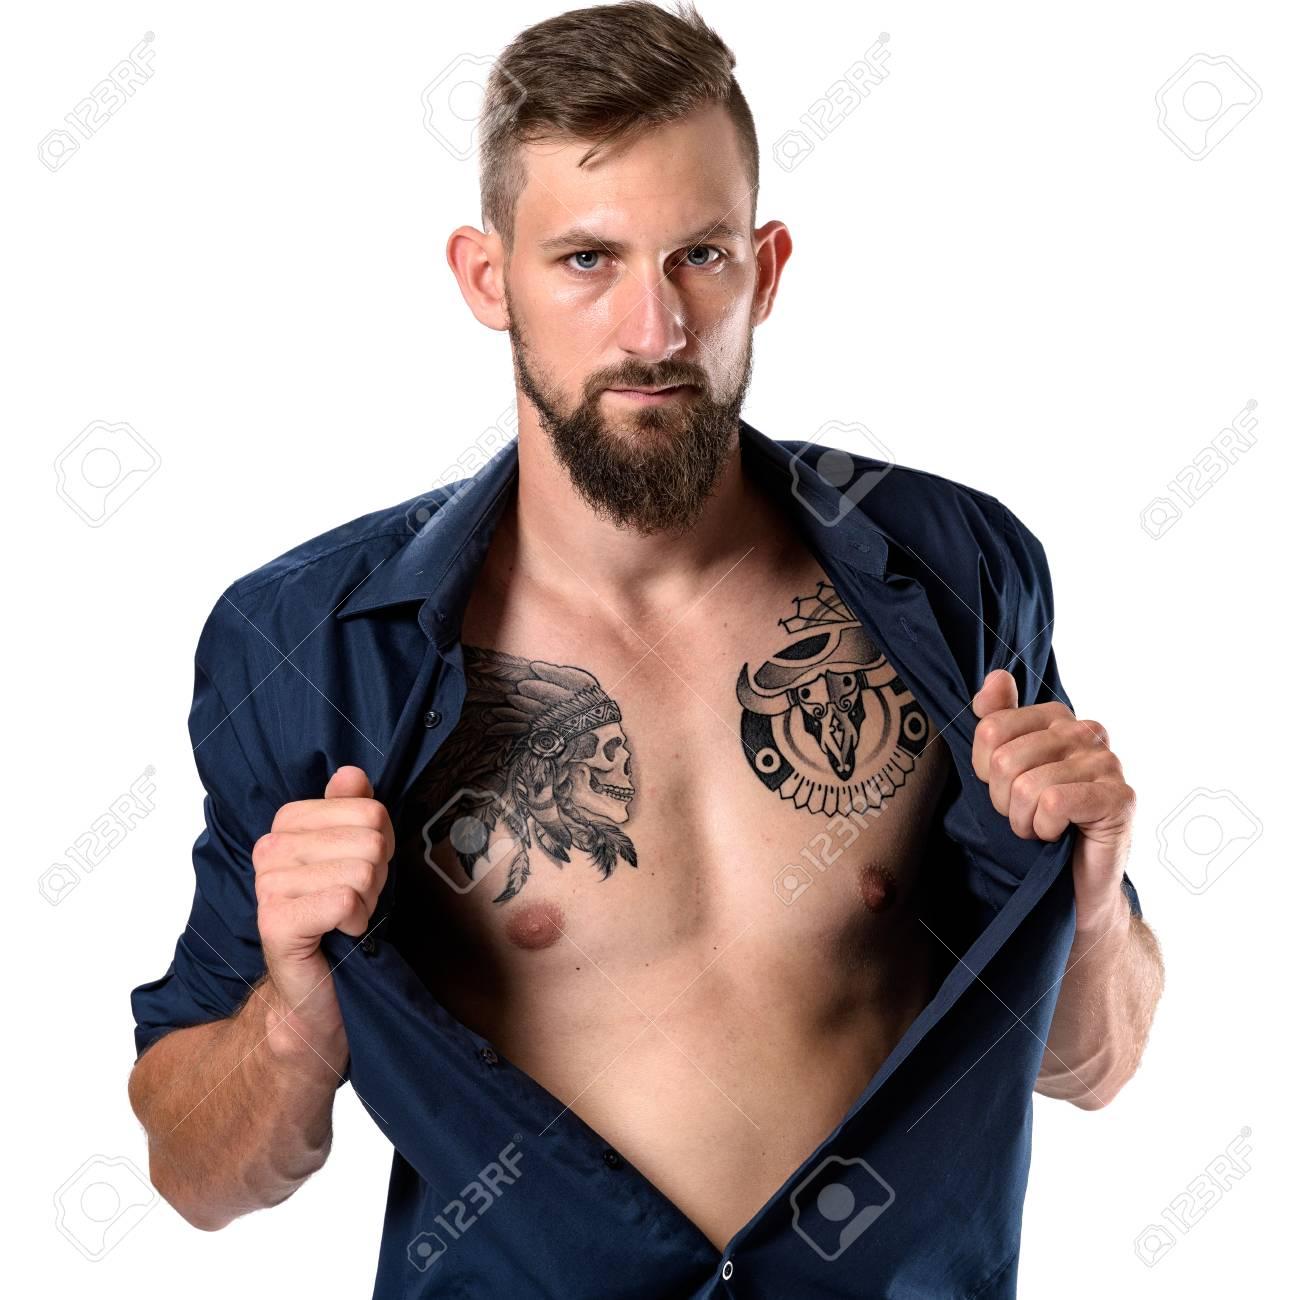 homme tatouage recherche)